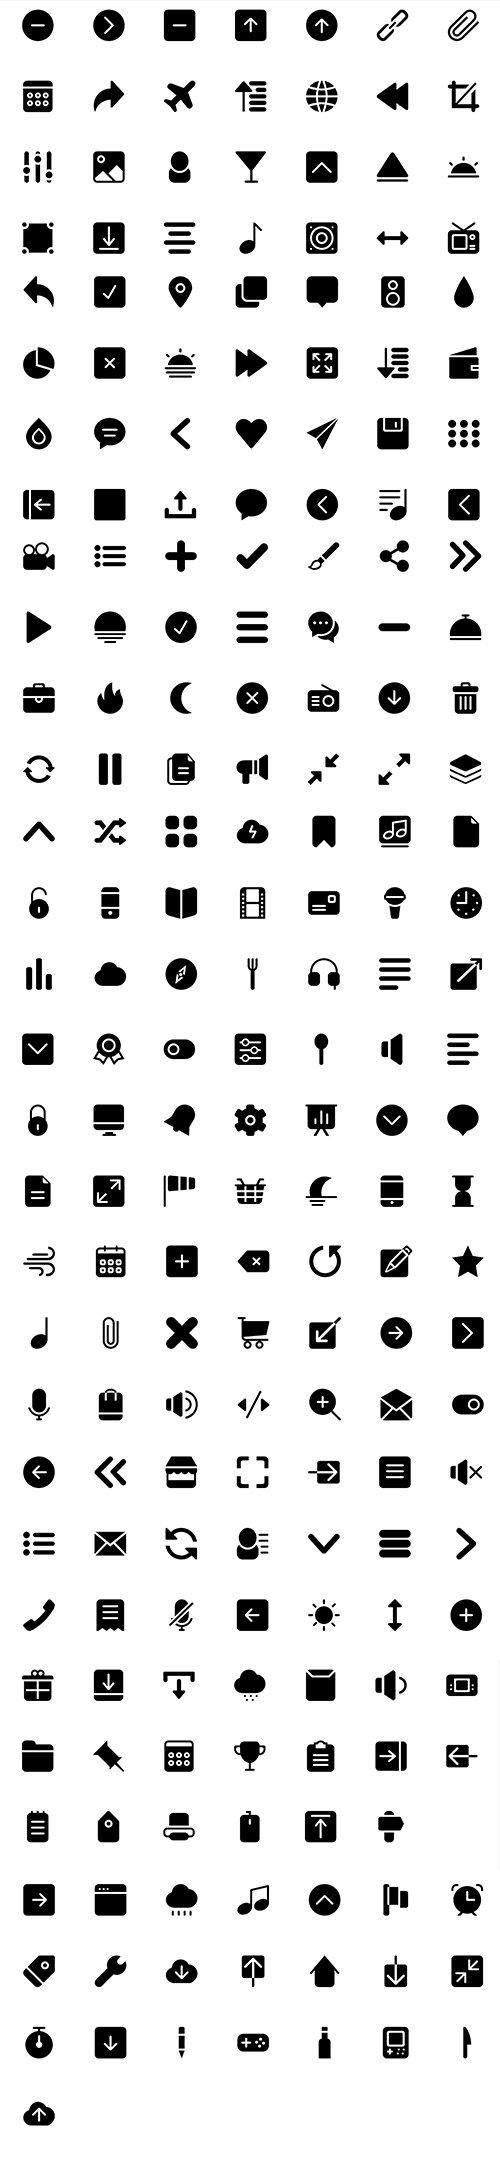 BigMug Solid Icon Pack